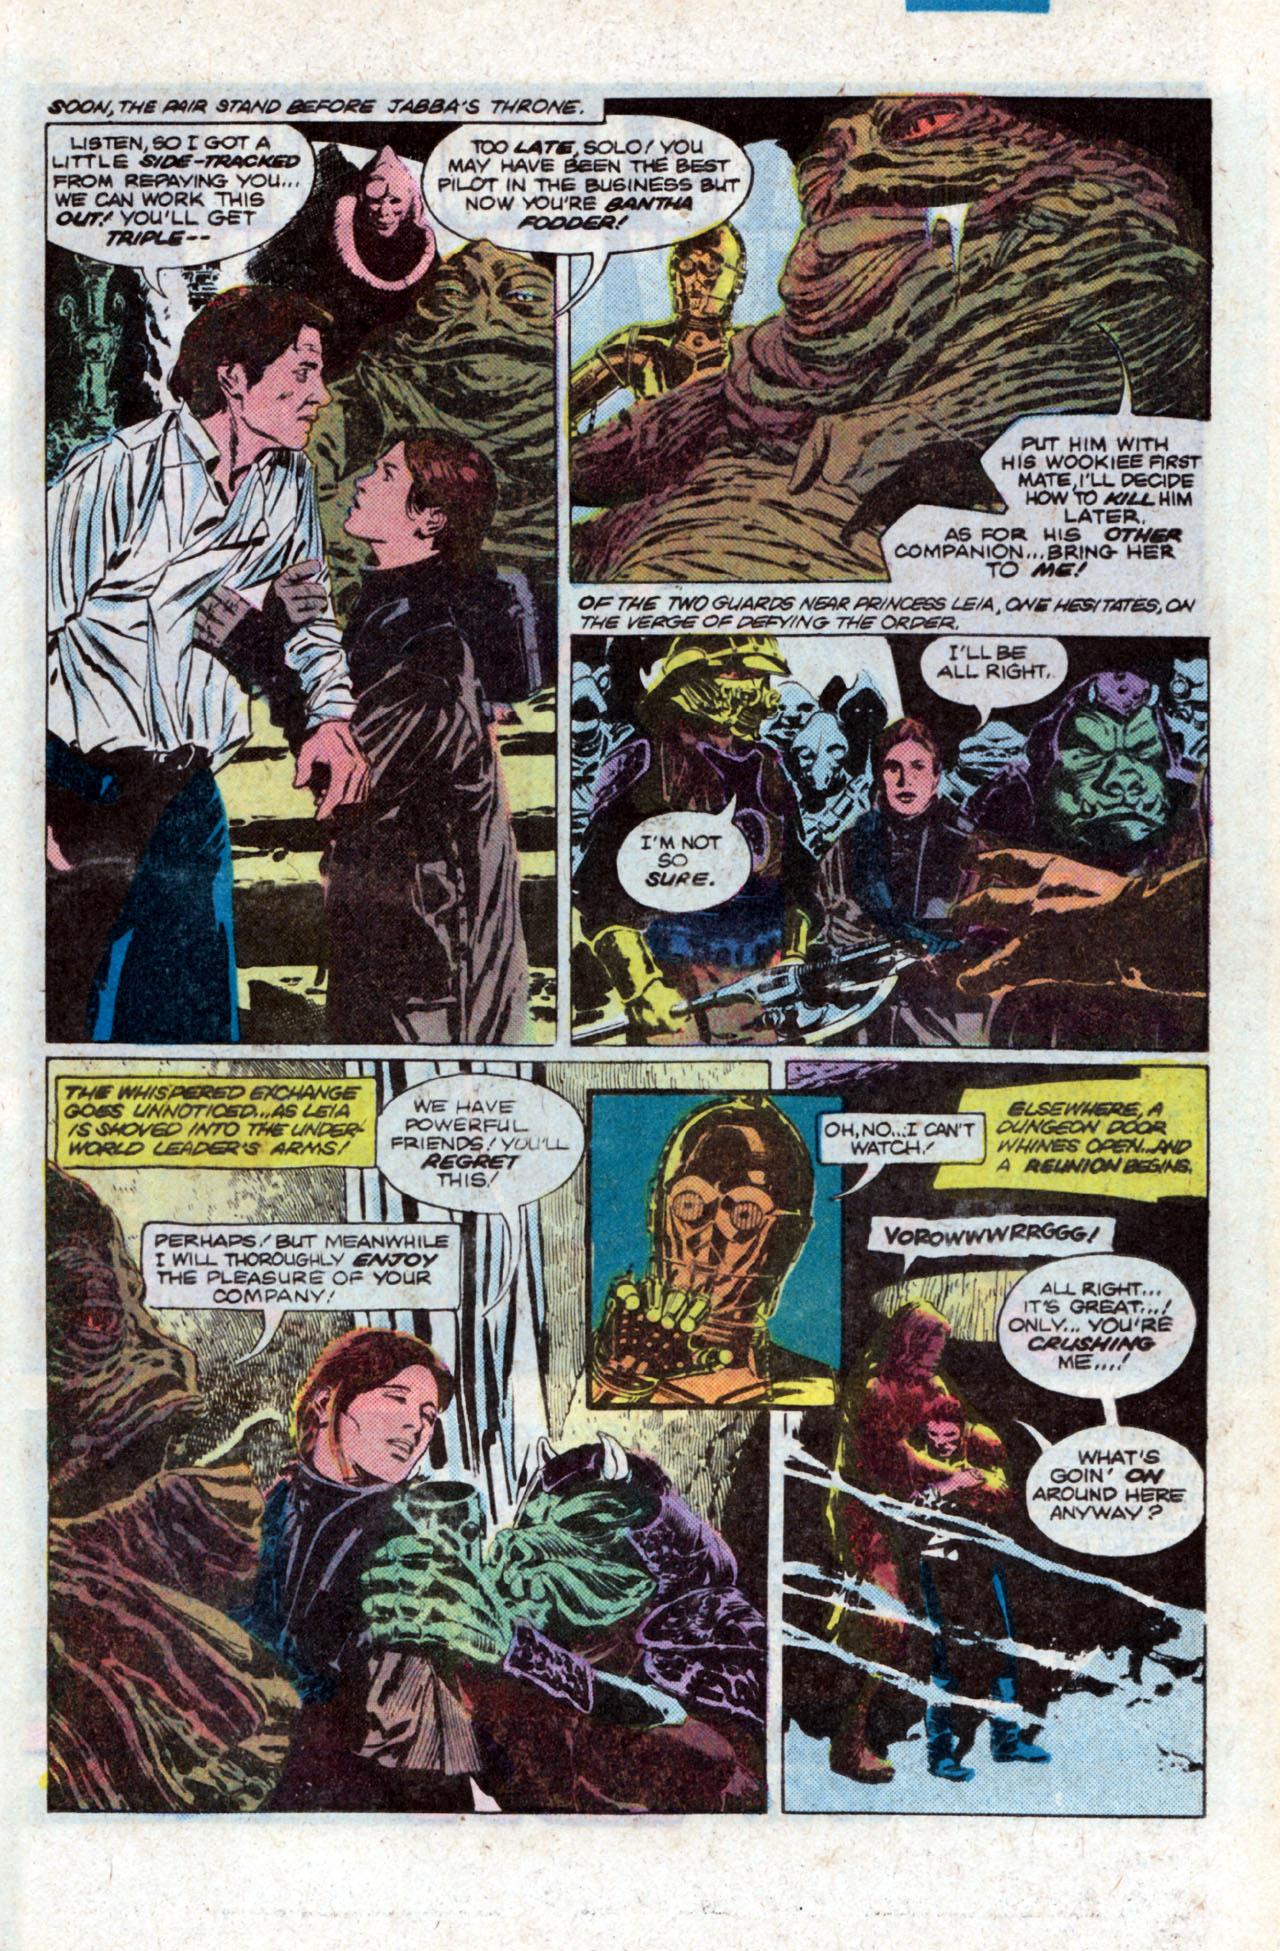 Read online Star Wars: Return of the Jedi comic -  Issue #1 - 17